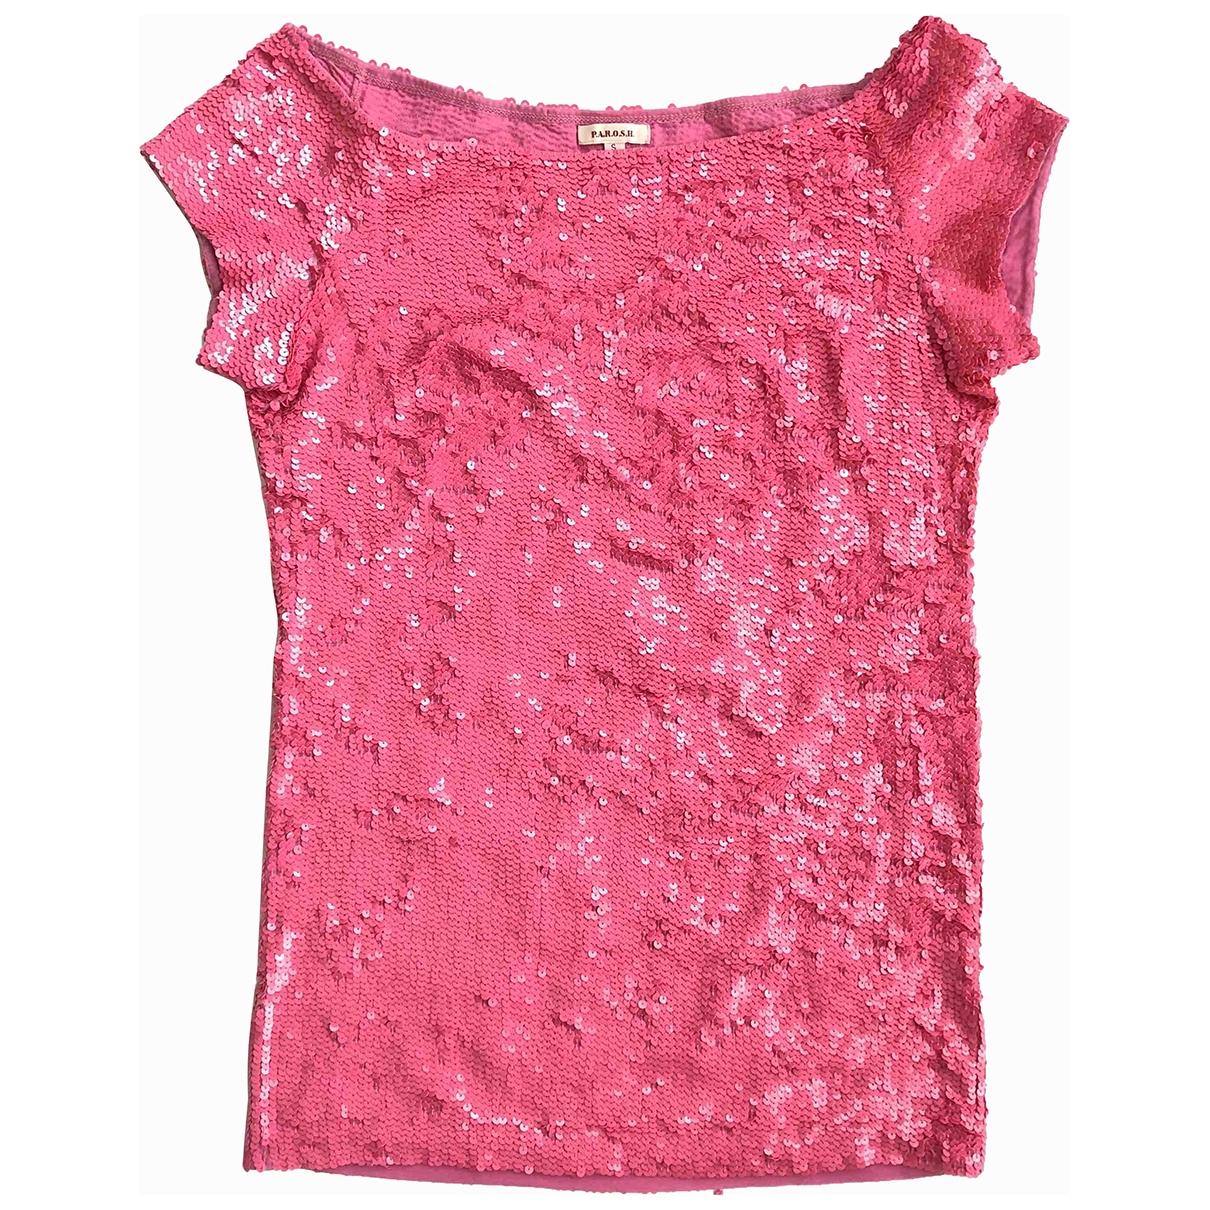 Parosh \N Pink Glitter  top for Women S International